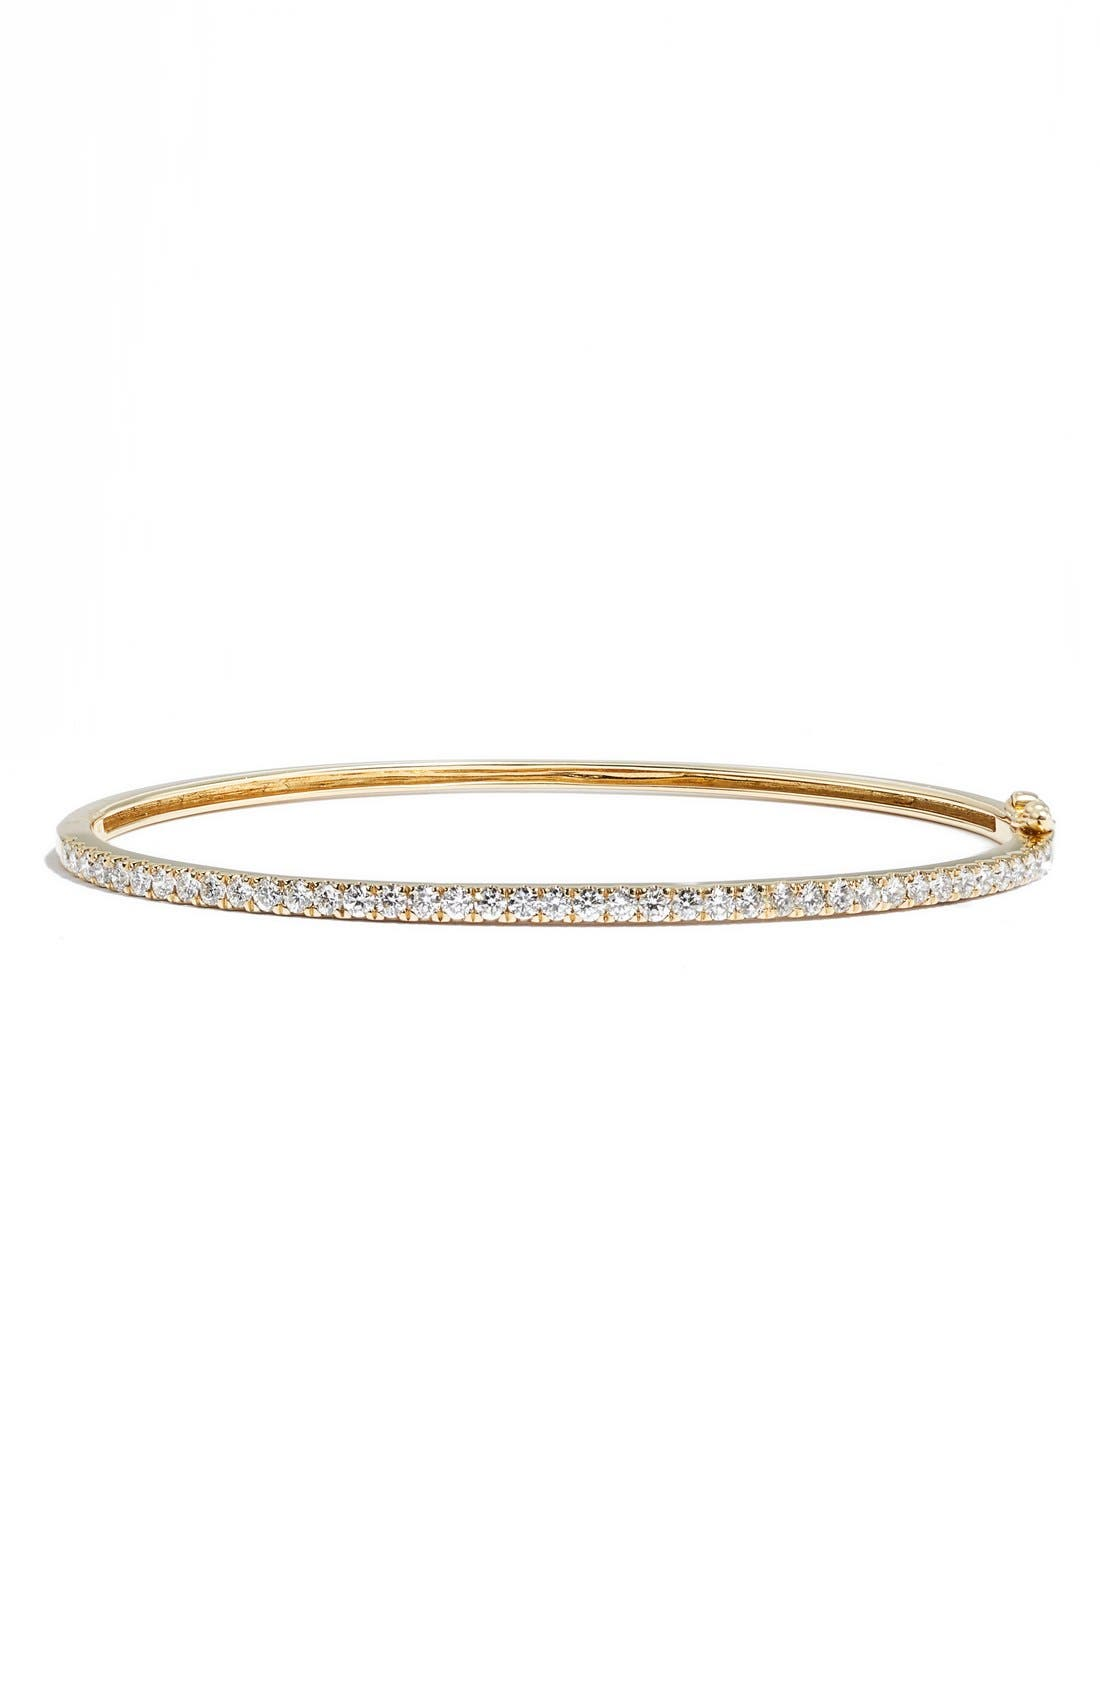 'Stackable' Large Skinny Diamond Bangle,                             Main thumbnail 1, color,                             YELLOW GOLD